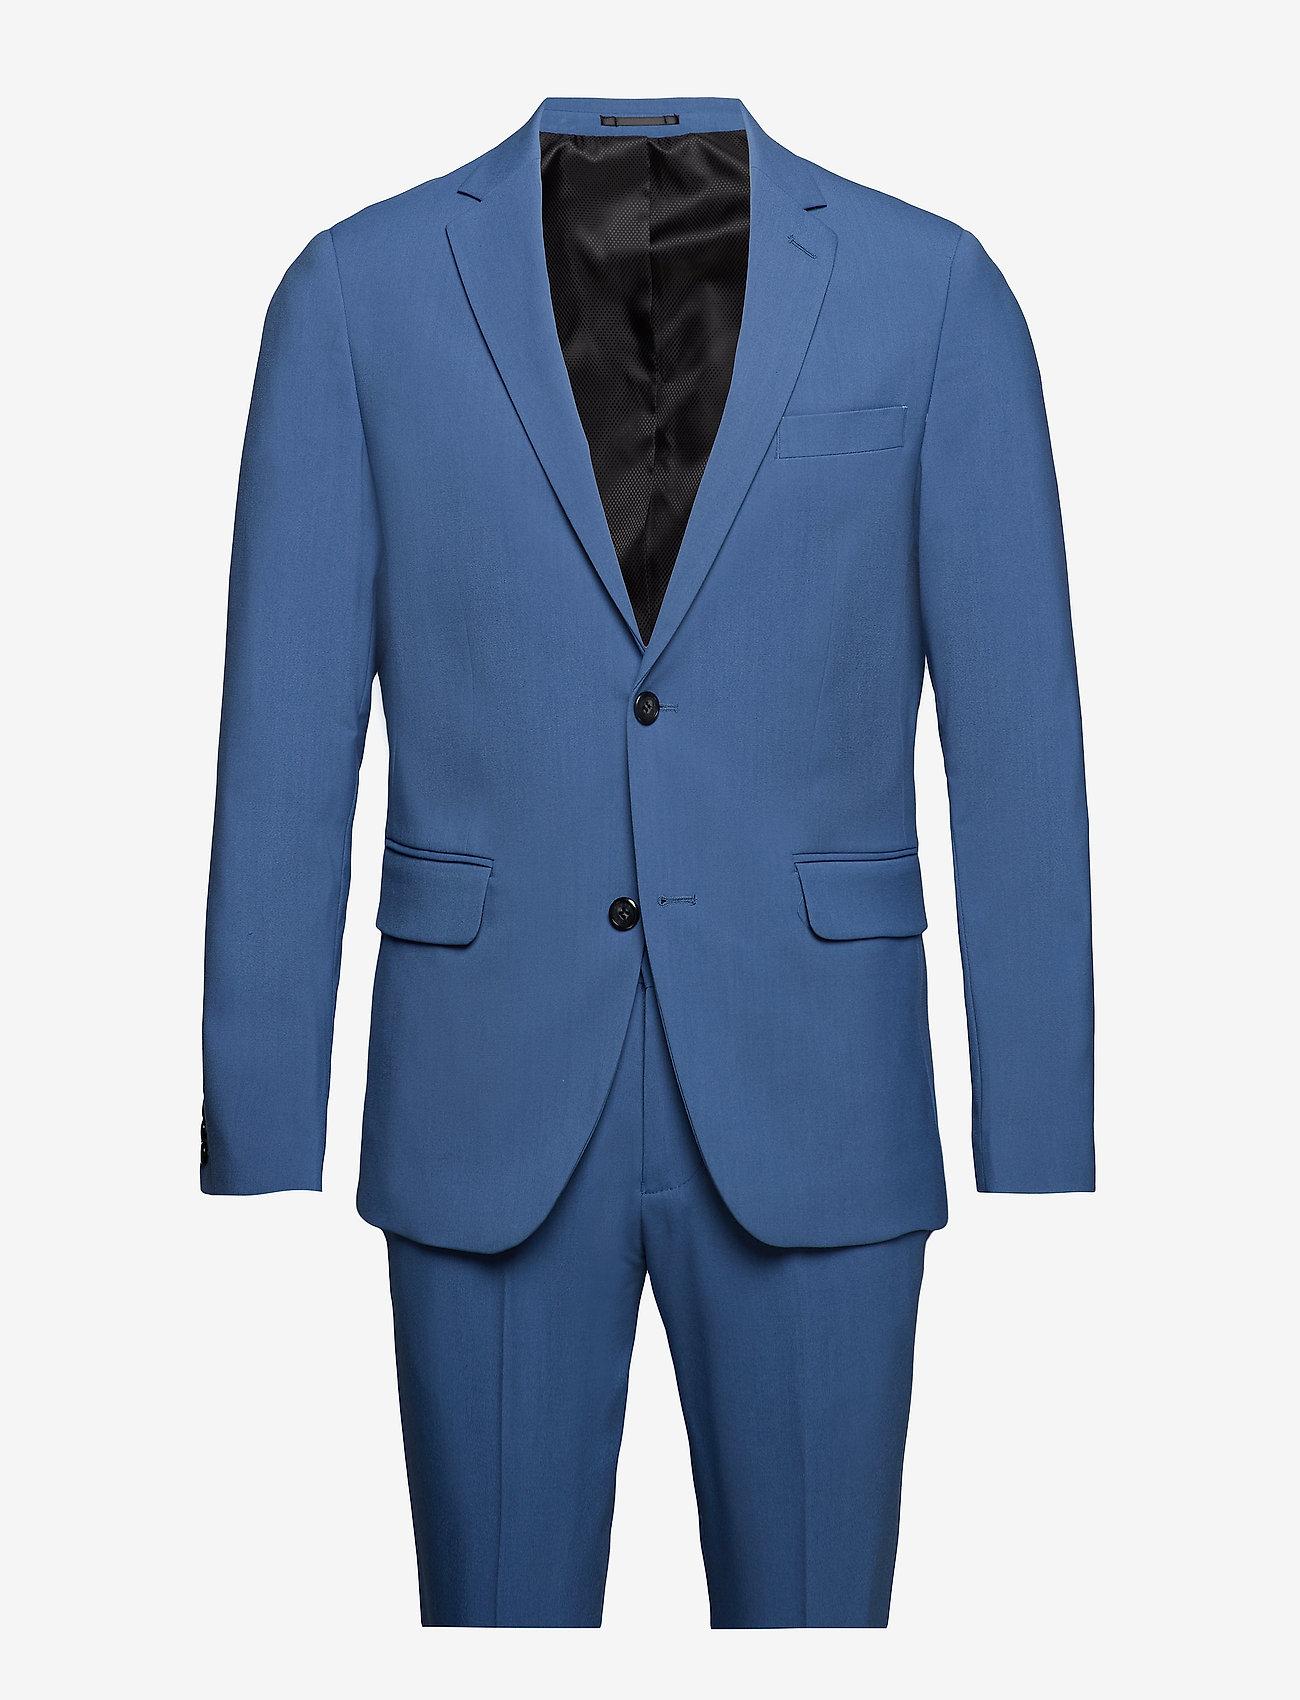 Lindbergh - Plain mens suit - yksiriviset puvut - mid blue - 0